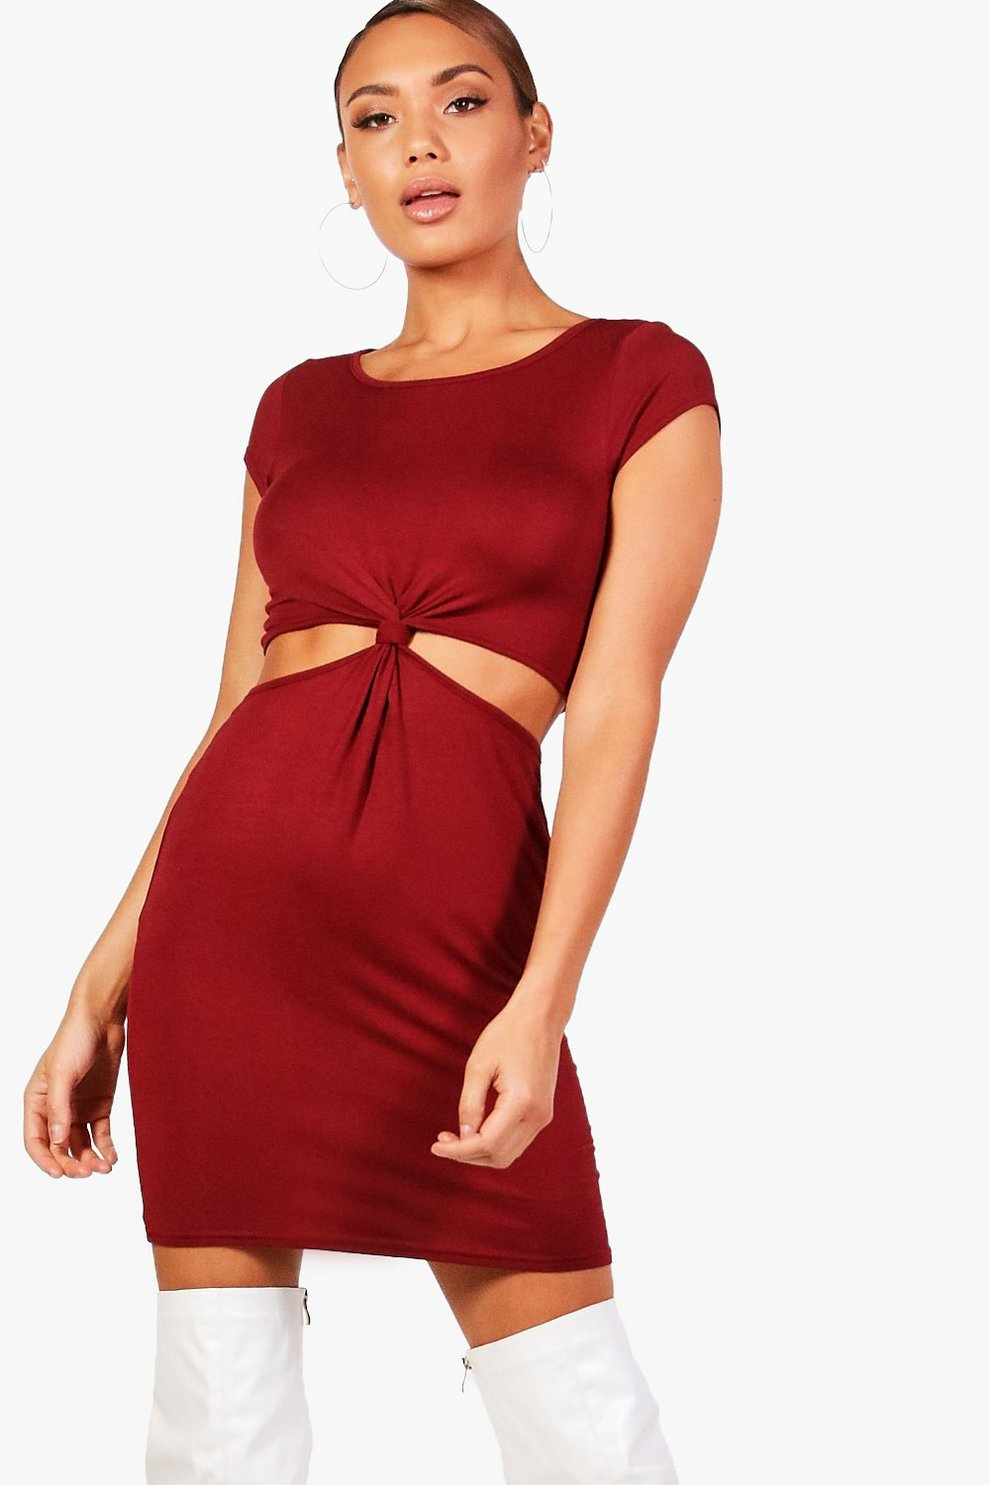 ad4263c4461 Cutout Side Cap Sleeve Knot Dress